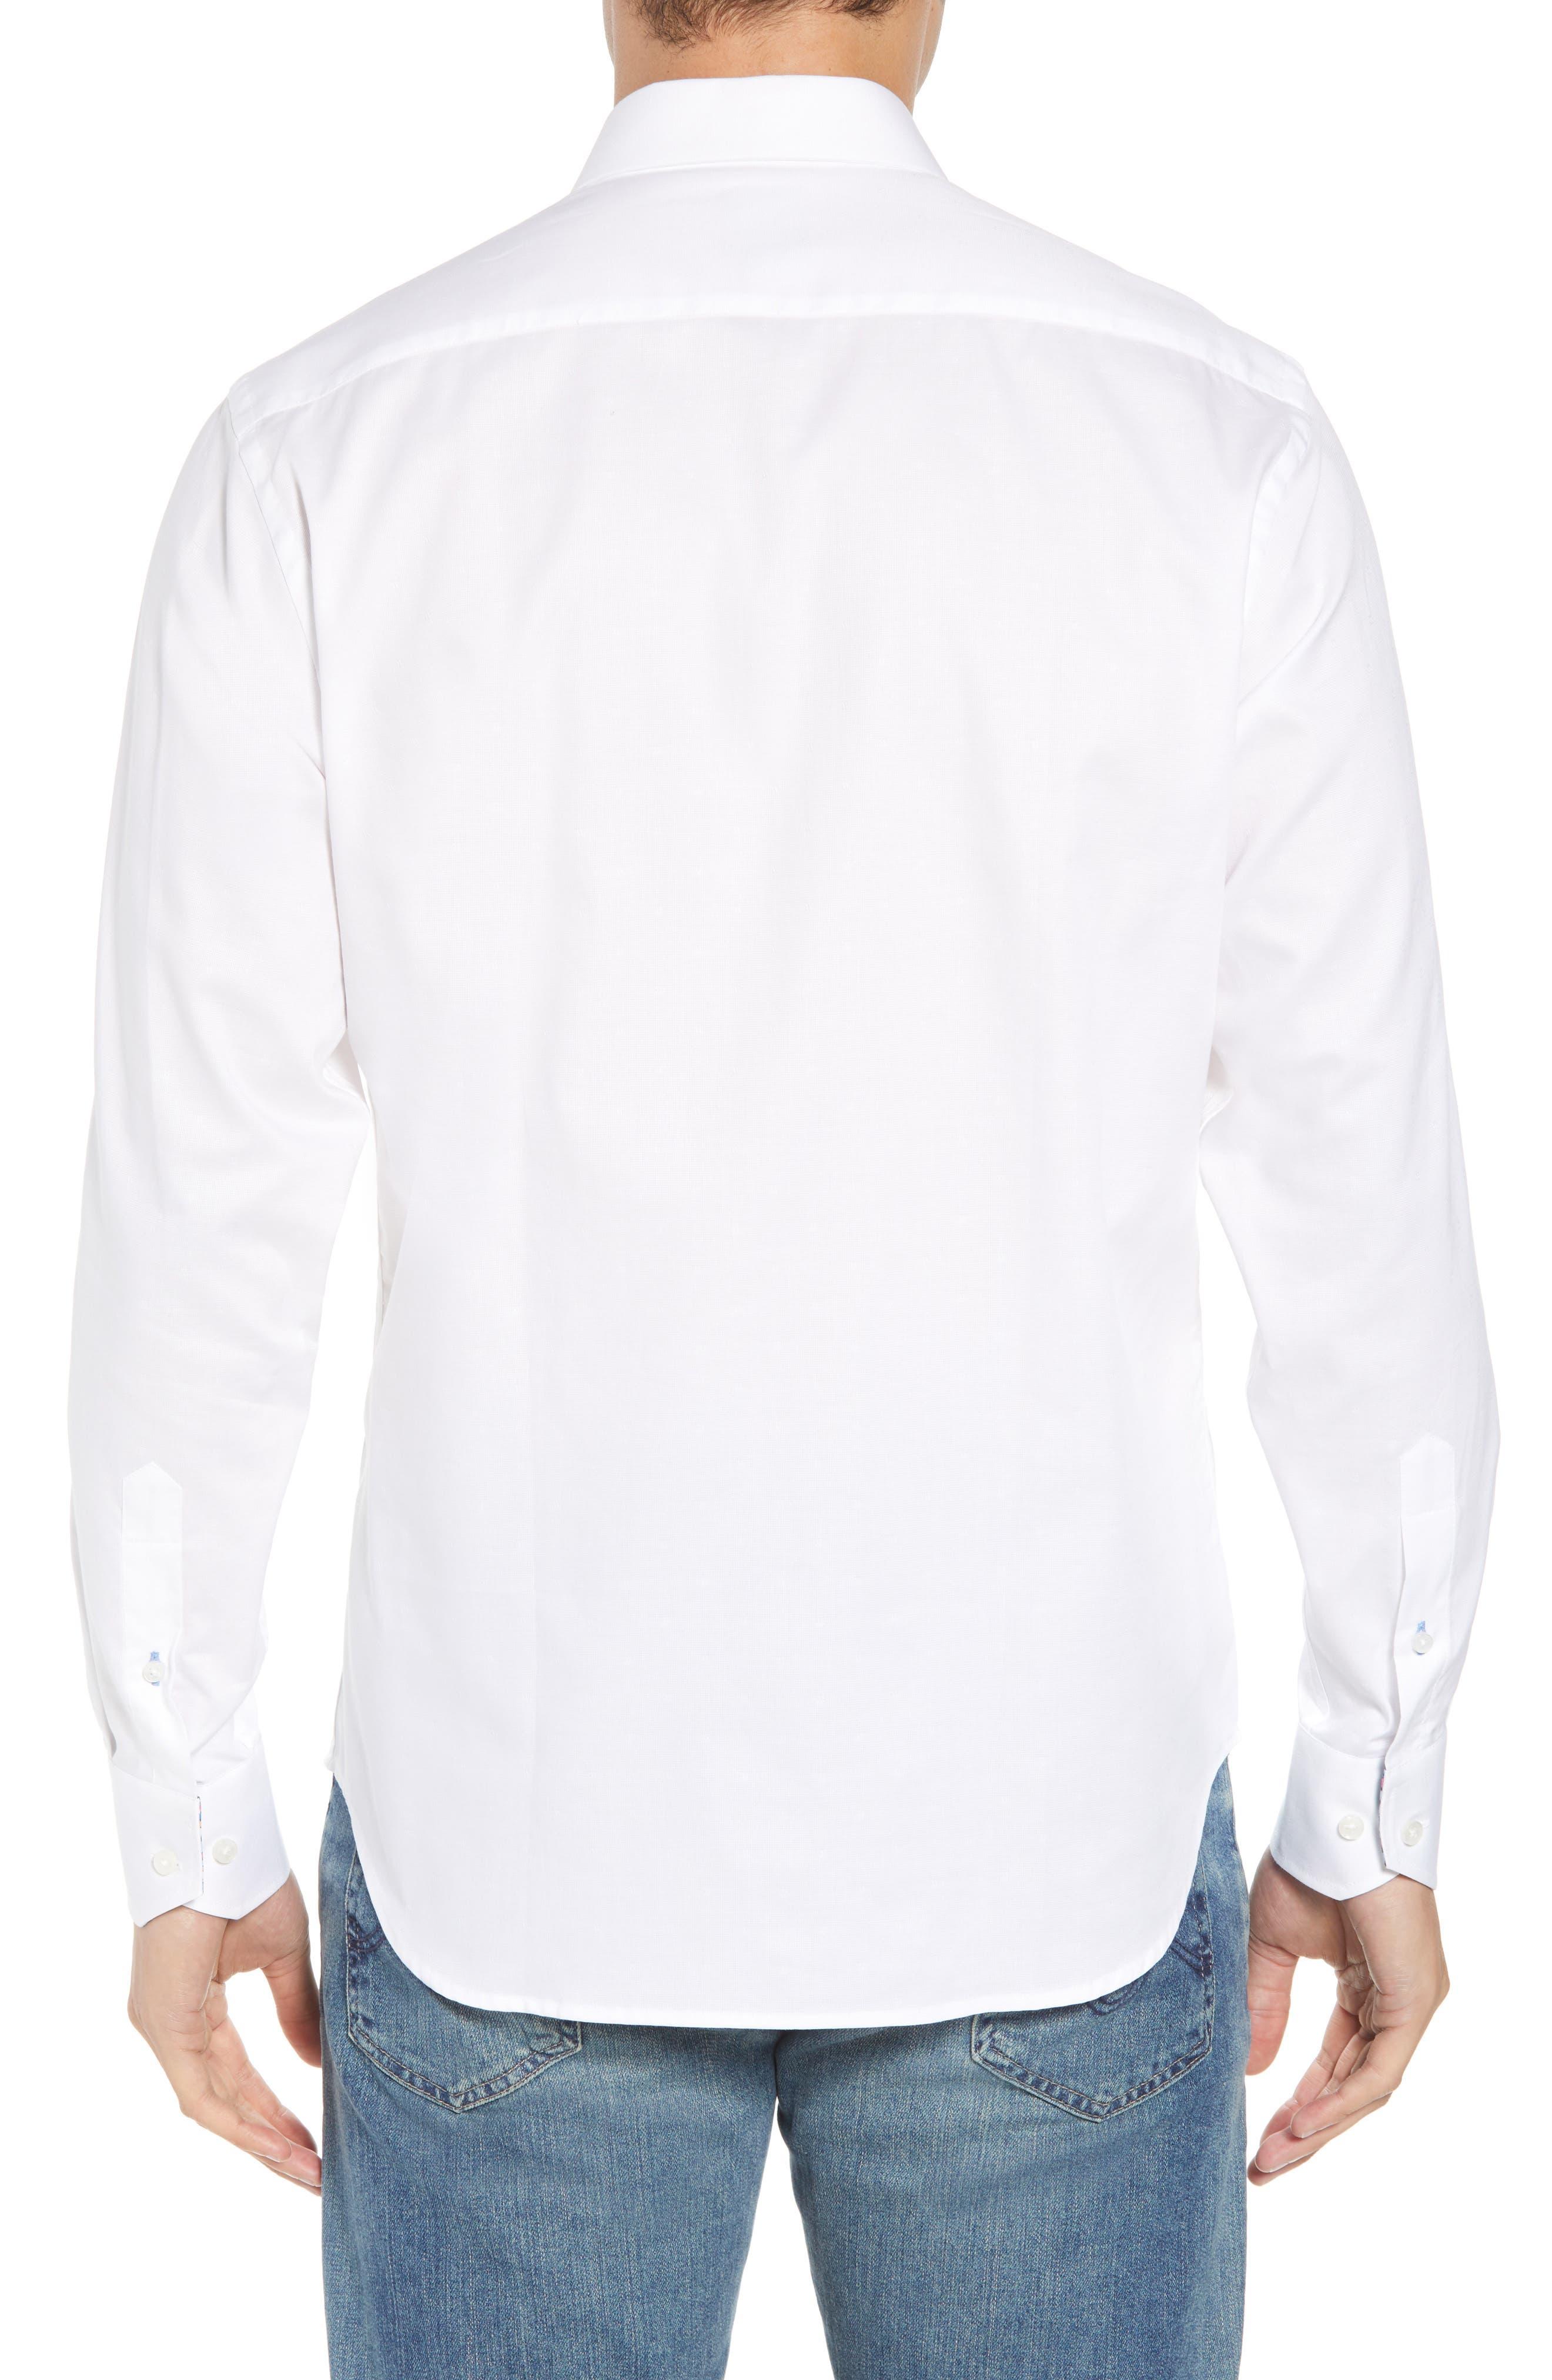 Baxley Regular Fit Sport Shirt,                             Alternate thumbnail 2, color,